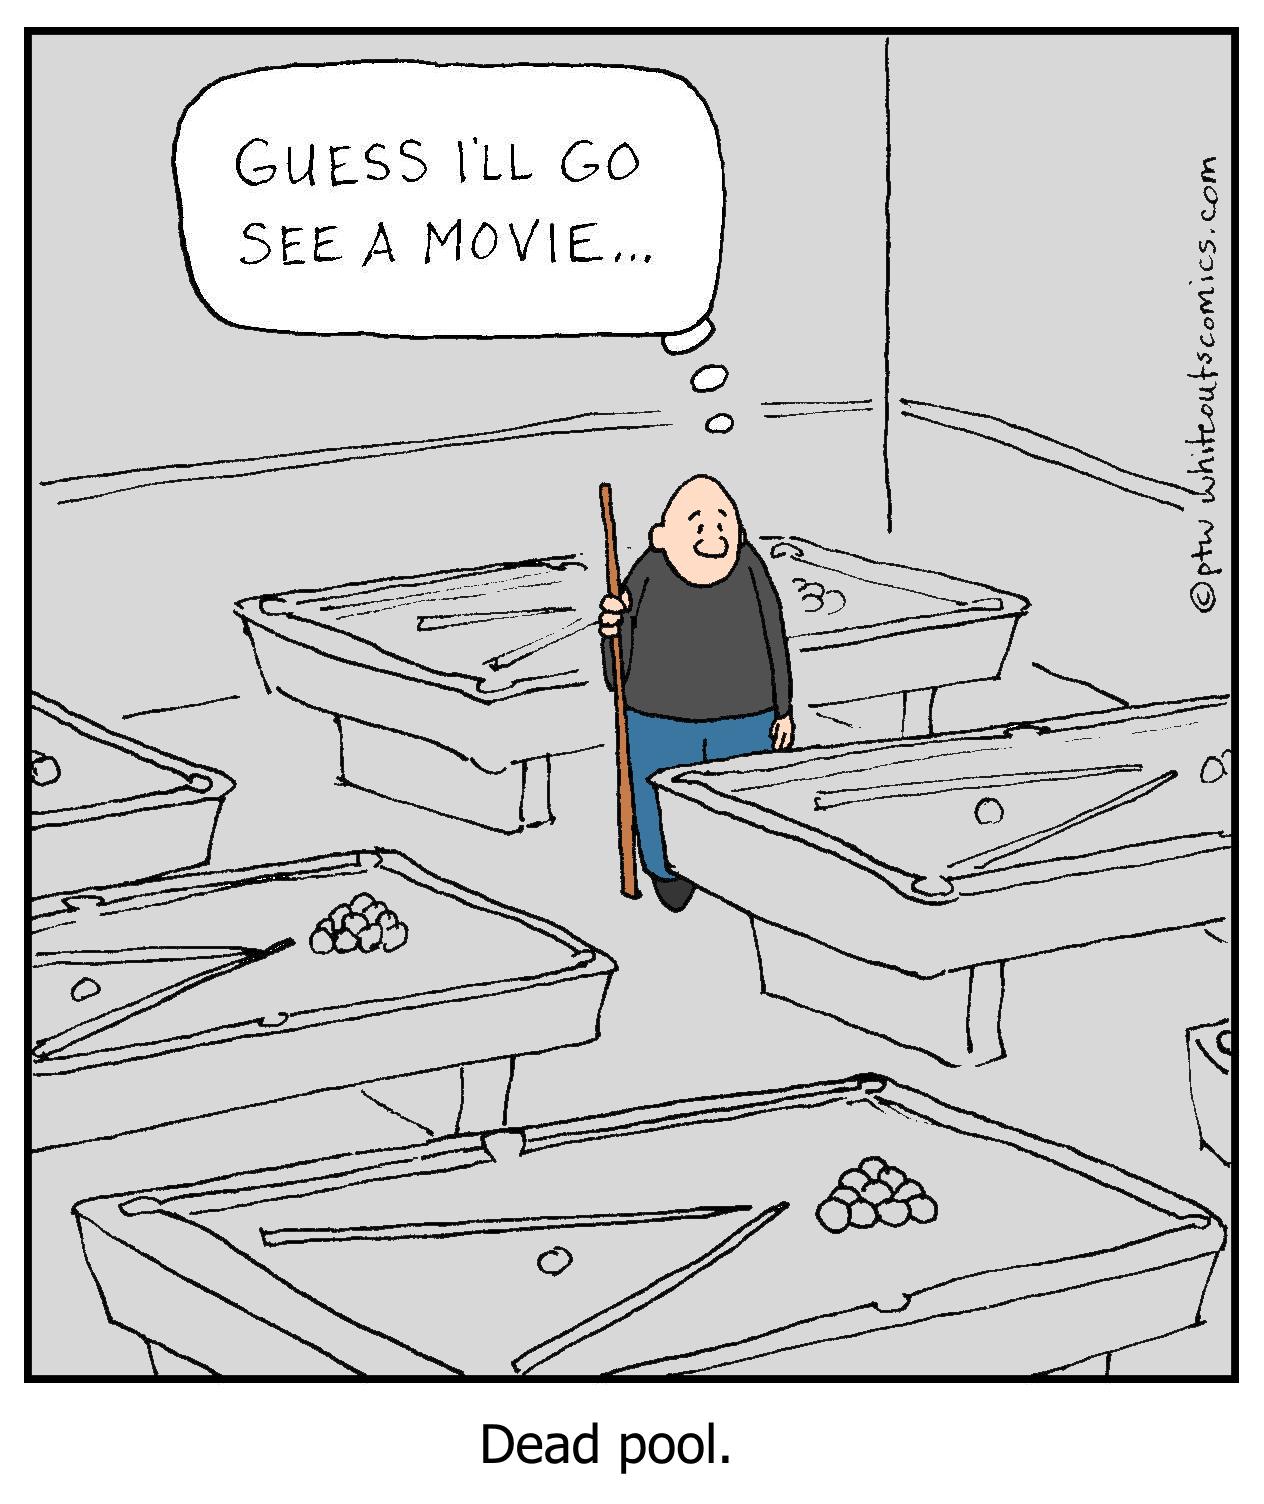 2-24-16 dead pool